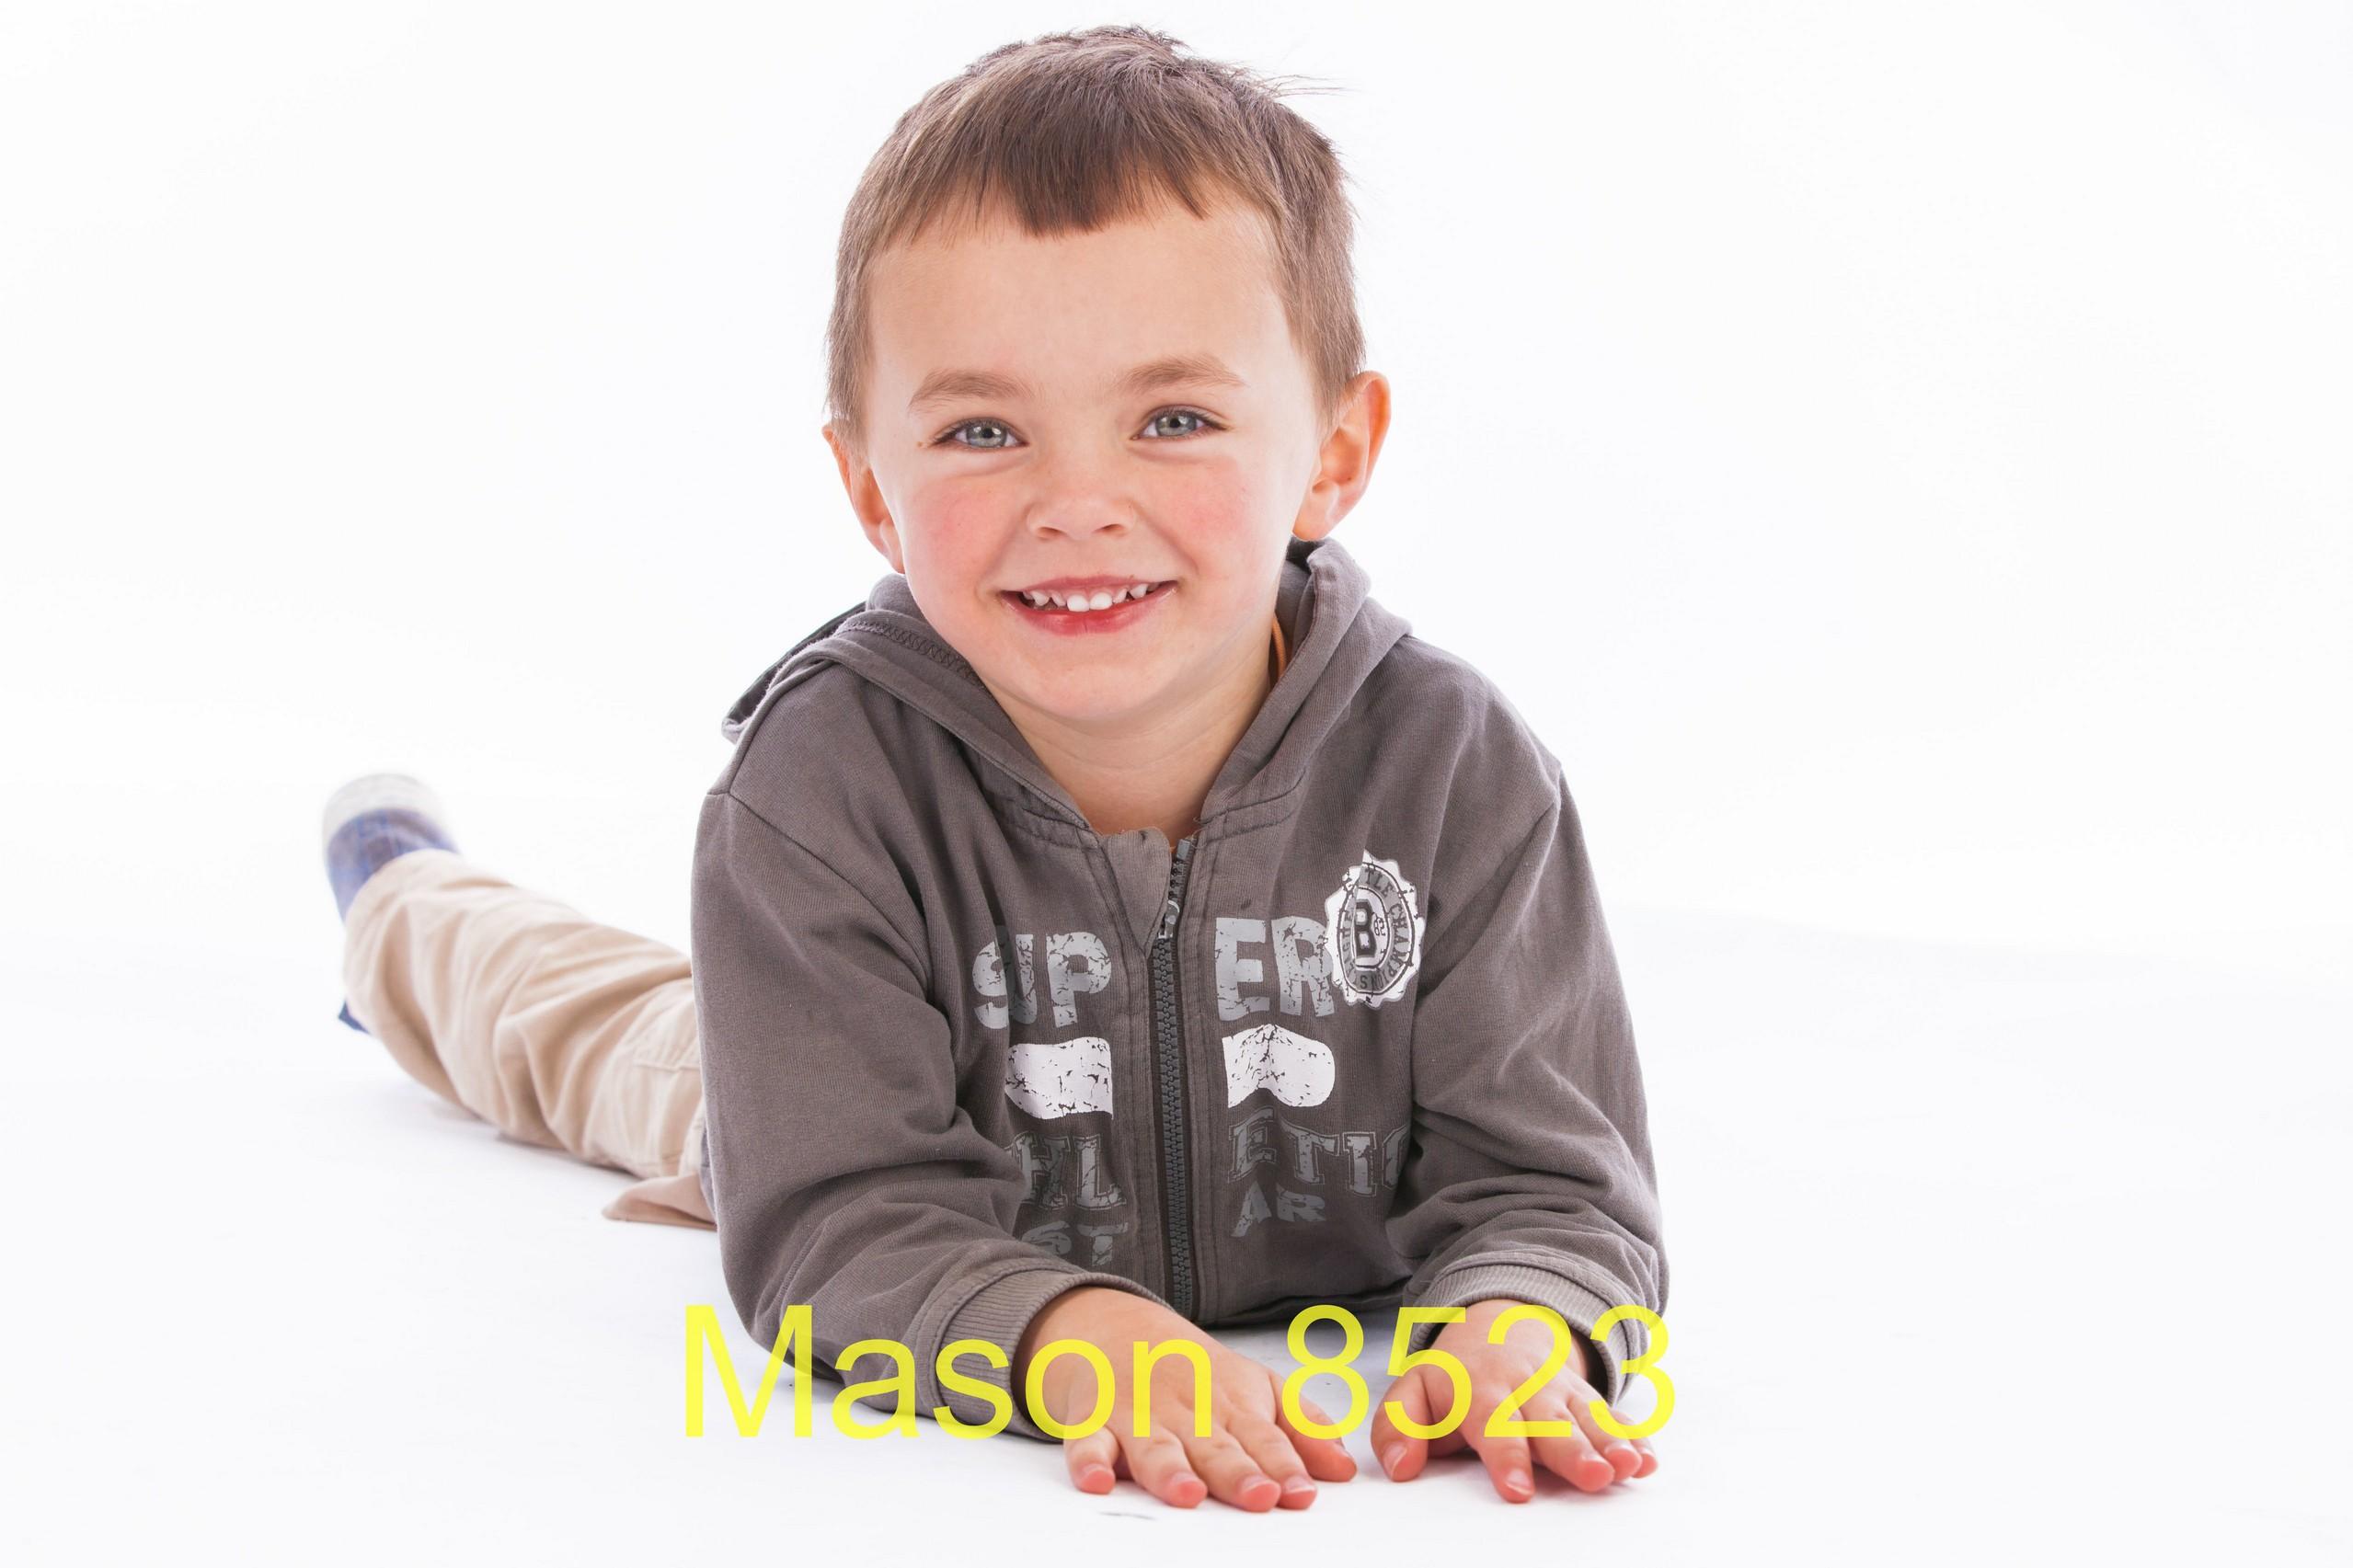 Mason 8523